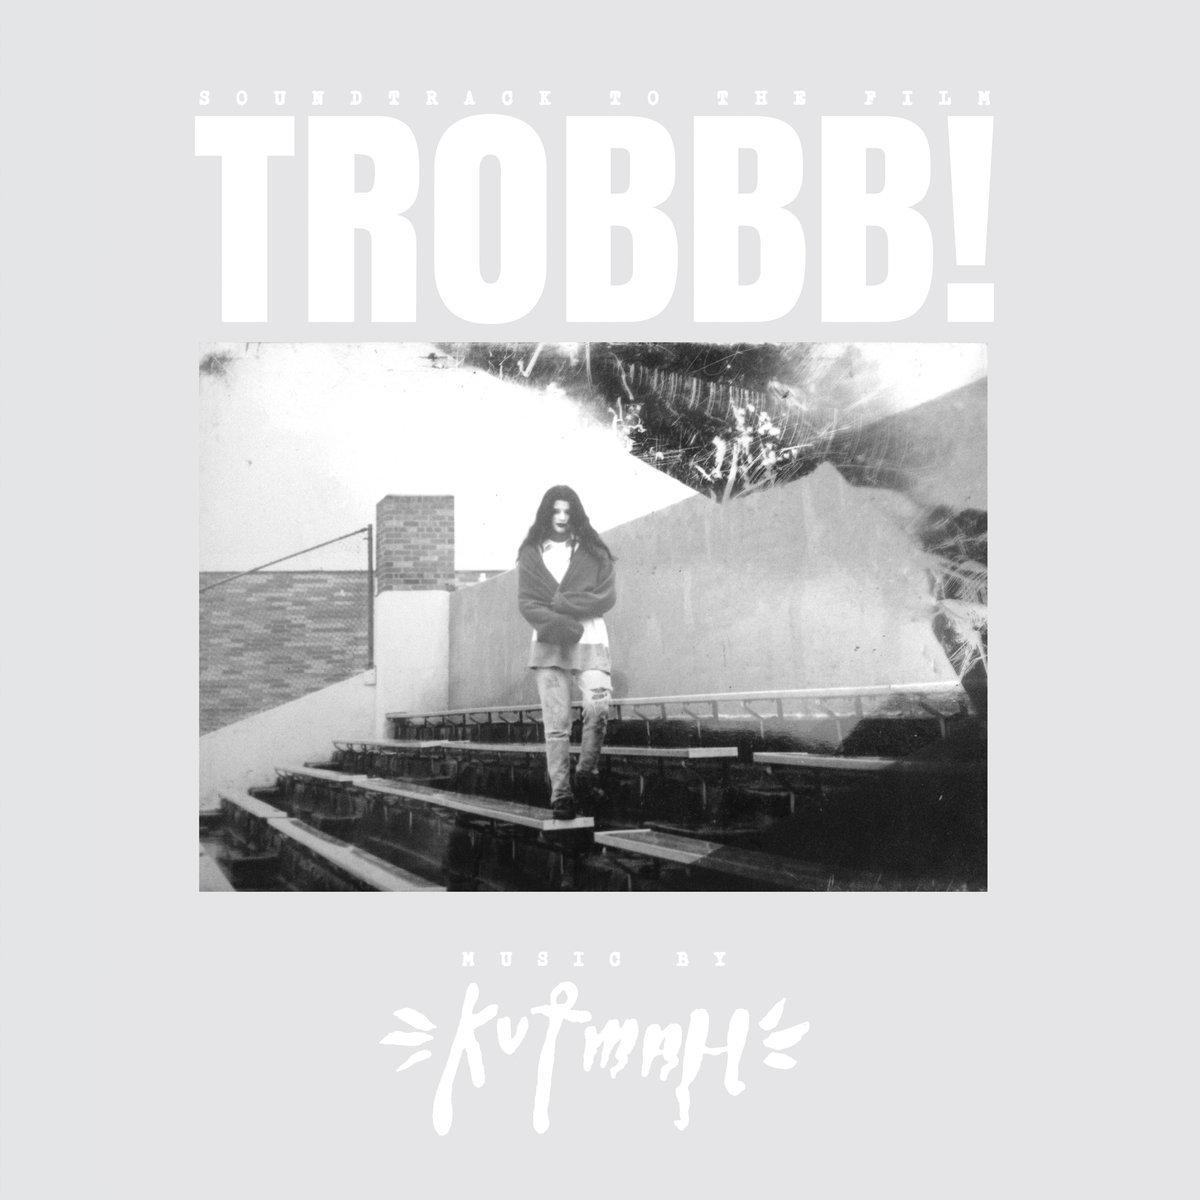 Trobbb! by Kutmah image